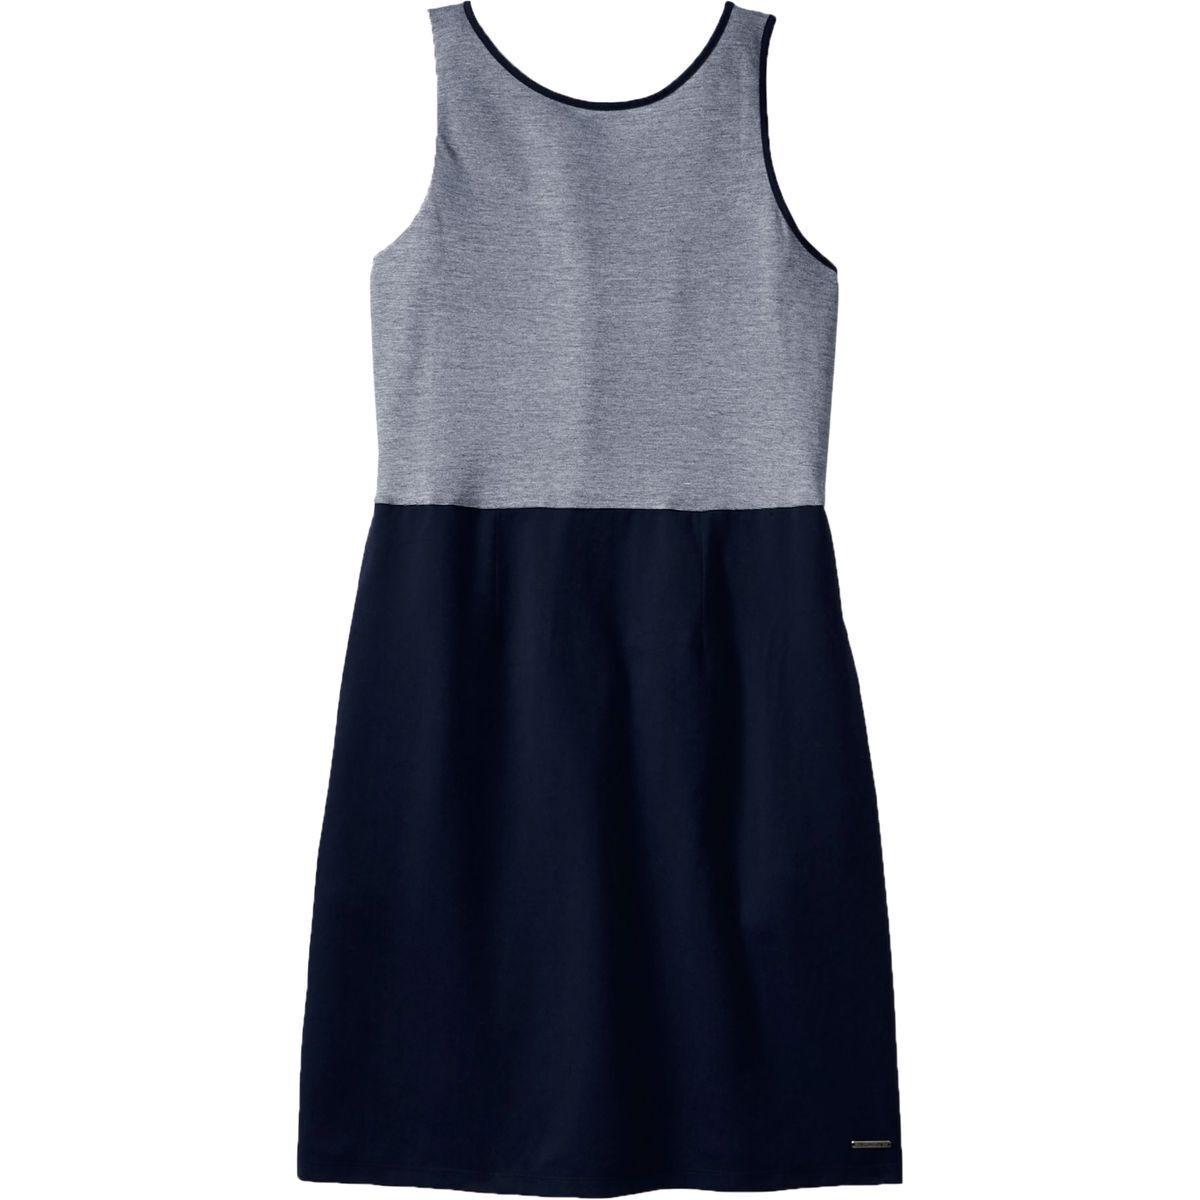 Smartwool Sloans Lake Dress Ink blueee blueee blueee Small 1f8396